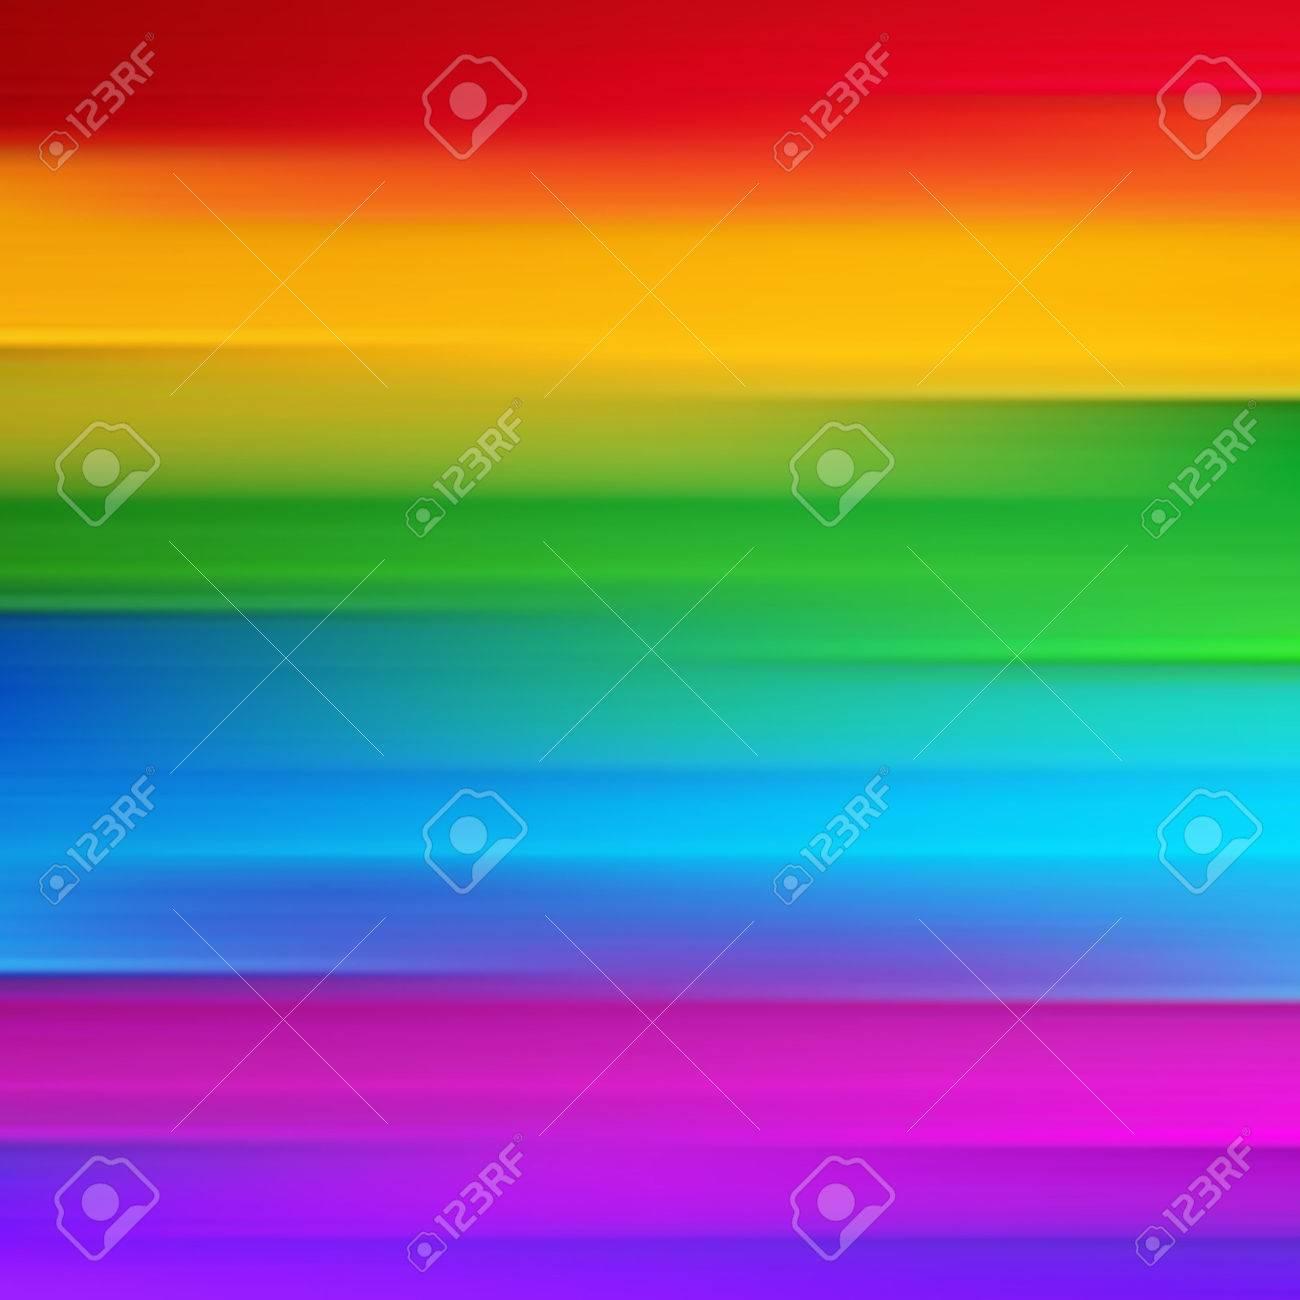 Arco Iris De Fondo Abstracto. Patrón De Colores A Rayas. Ilustración ...